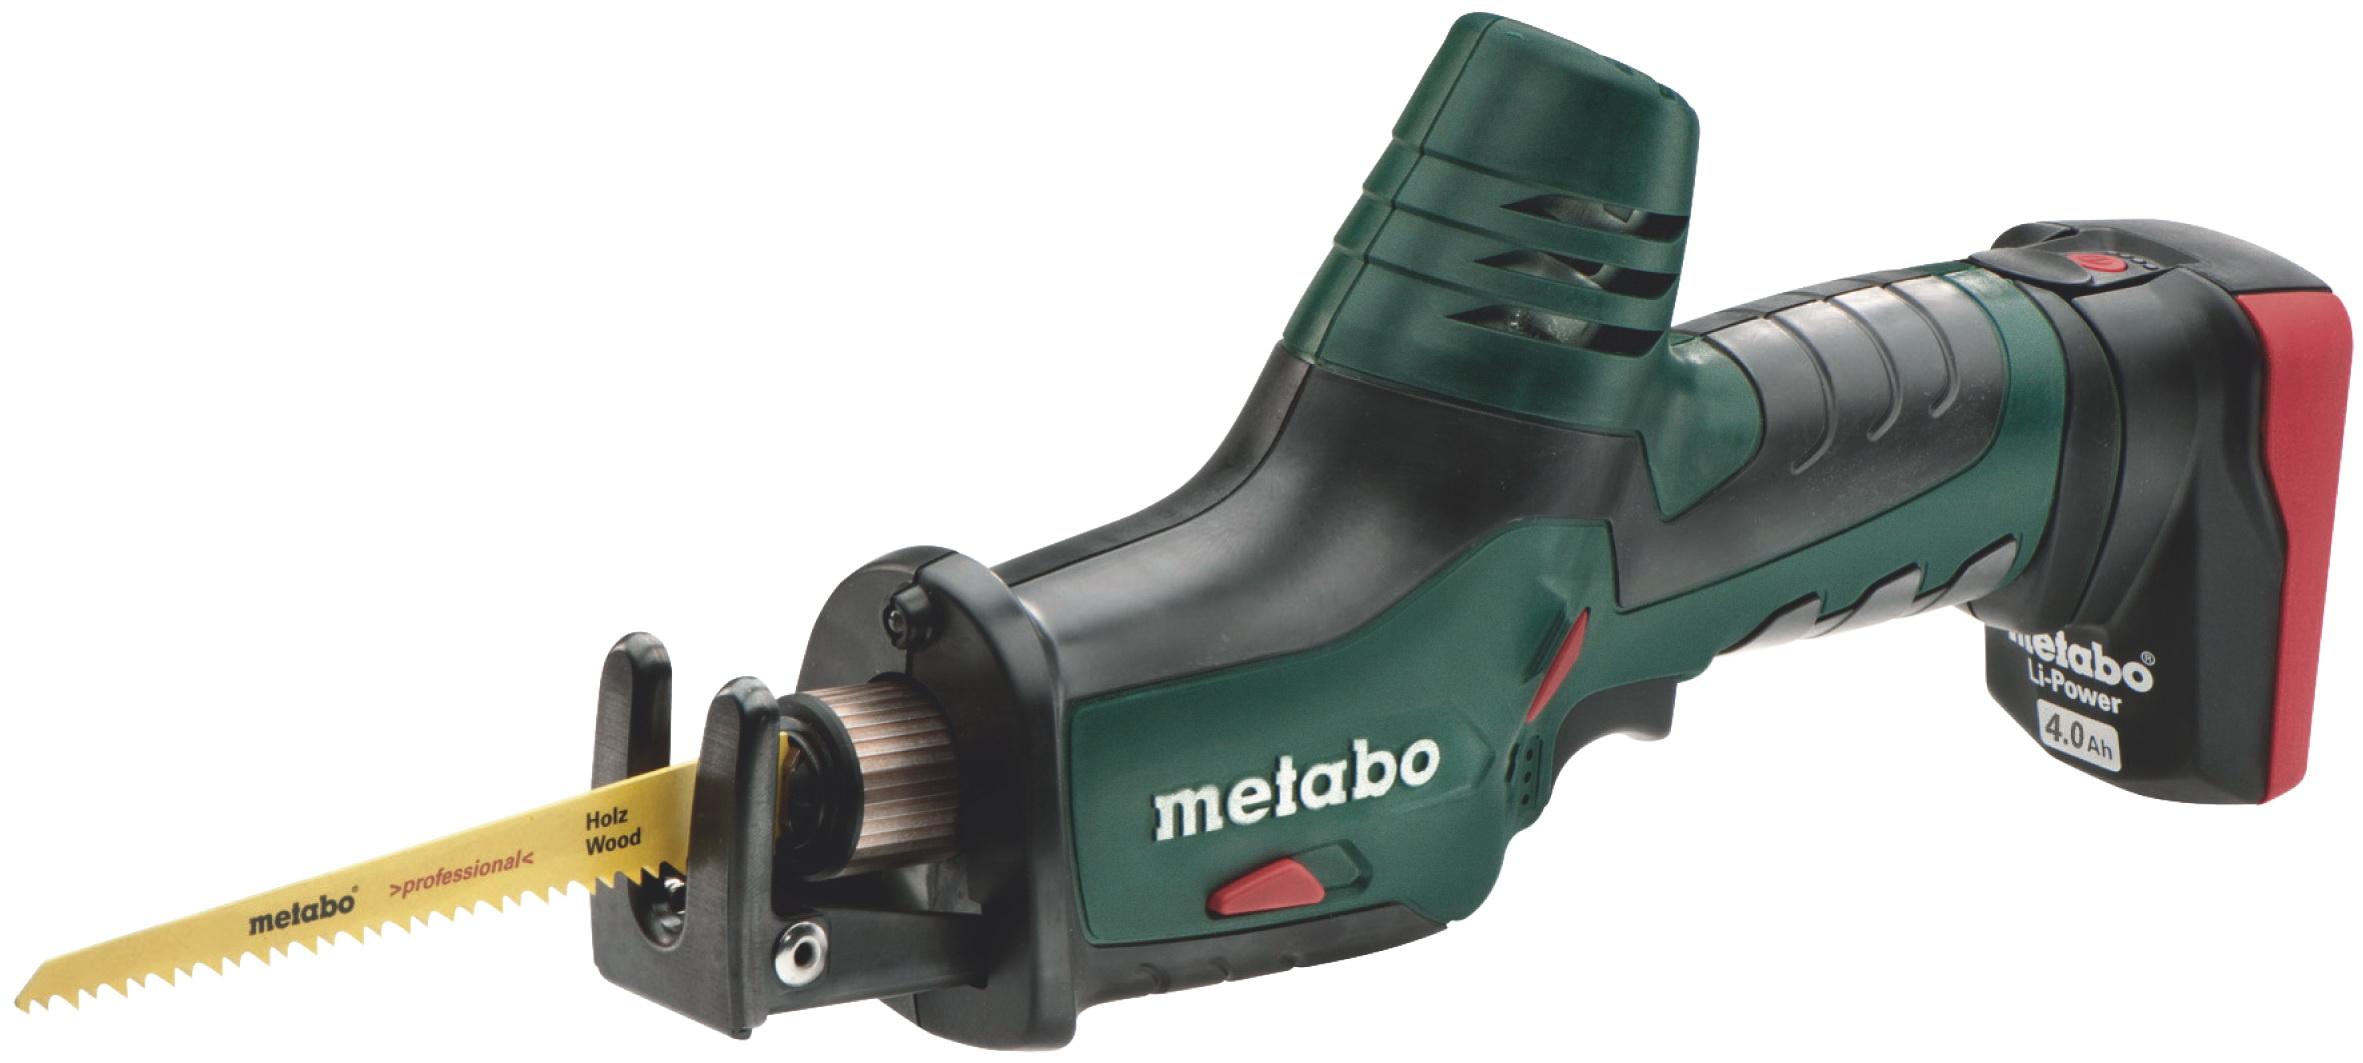 Аккумуляторная ножовка Metabo Powermaxx ase 4.0 (602264750)